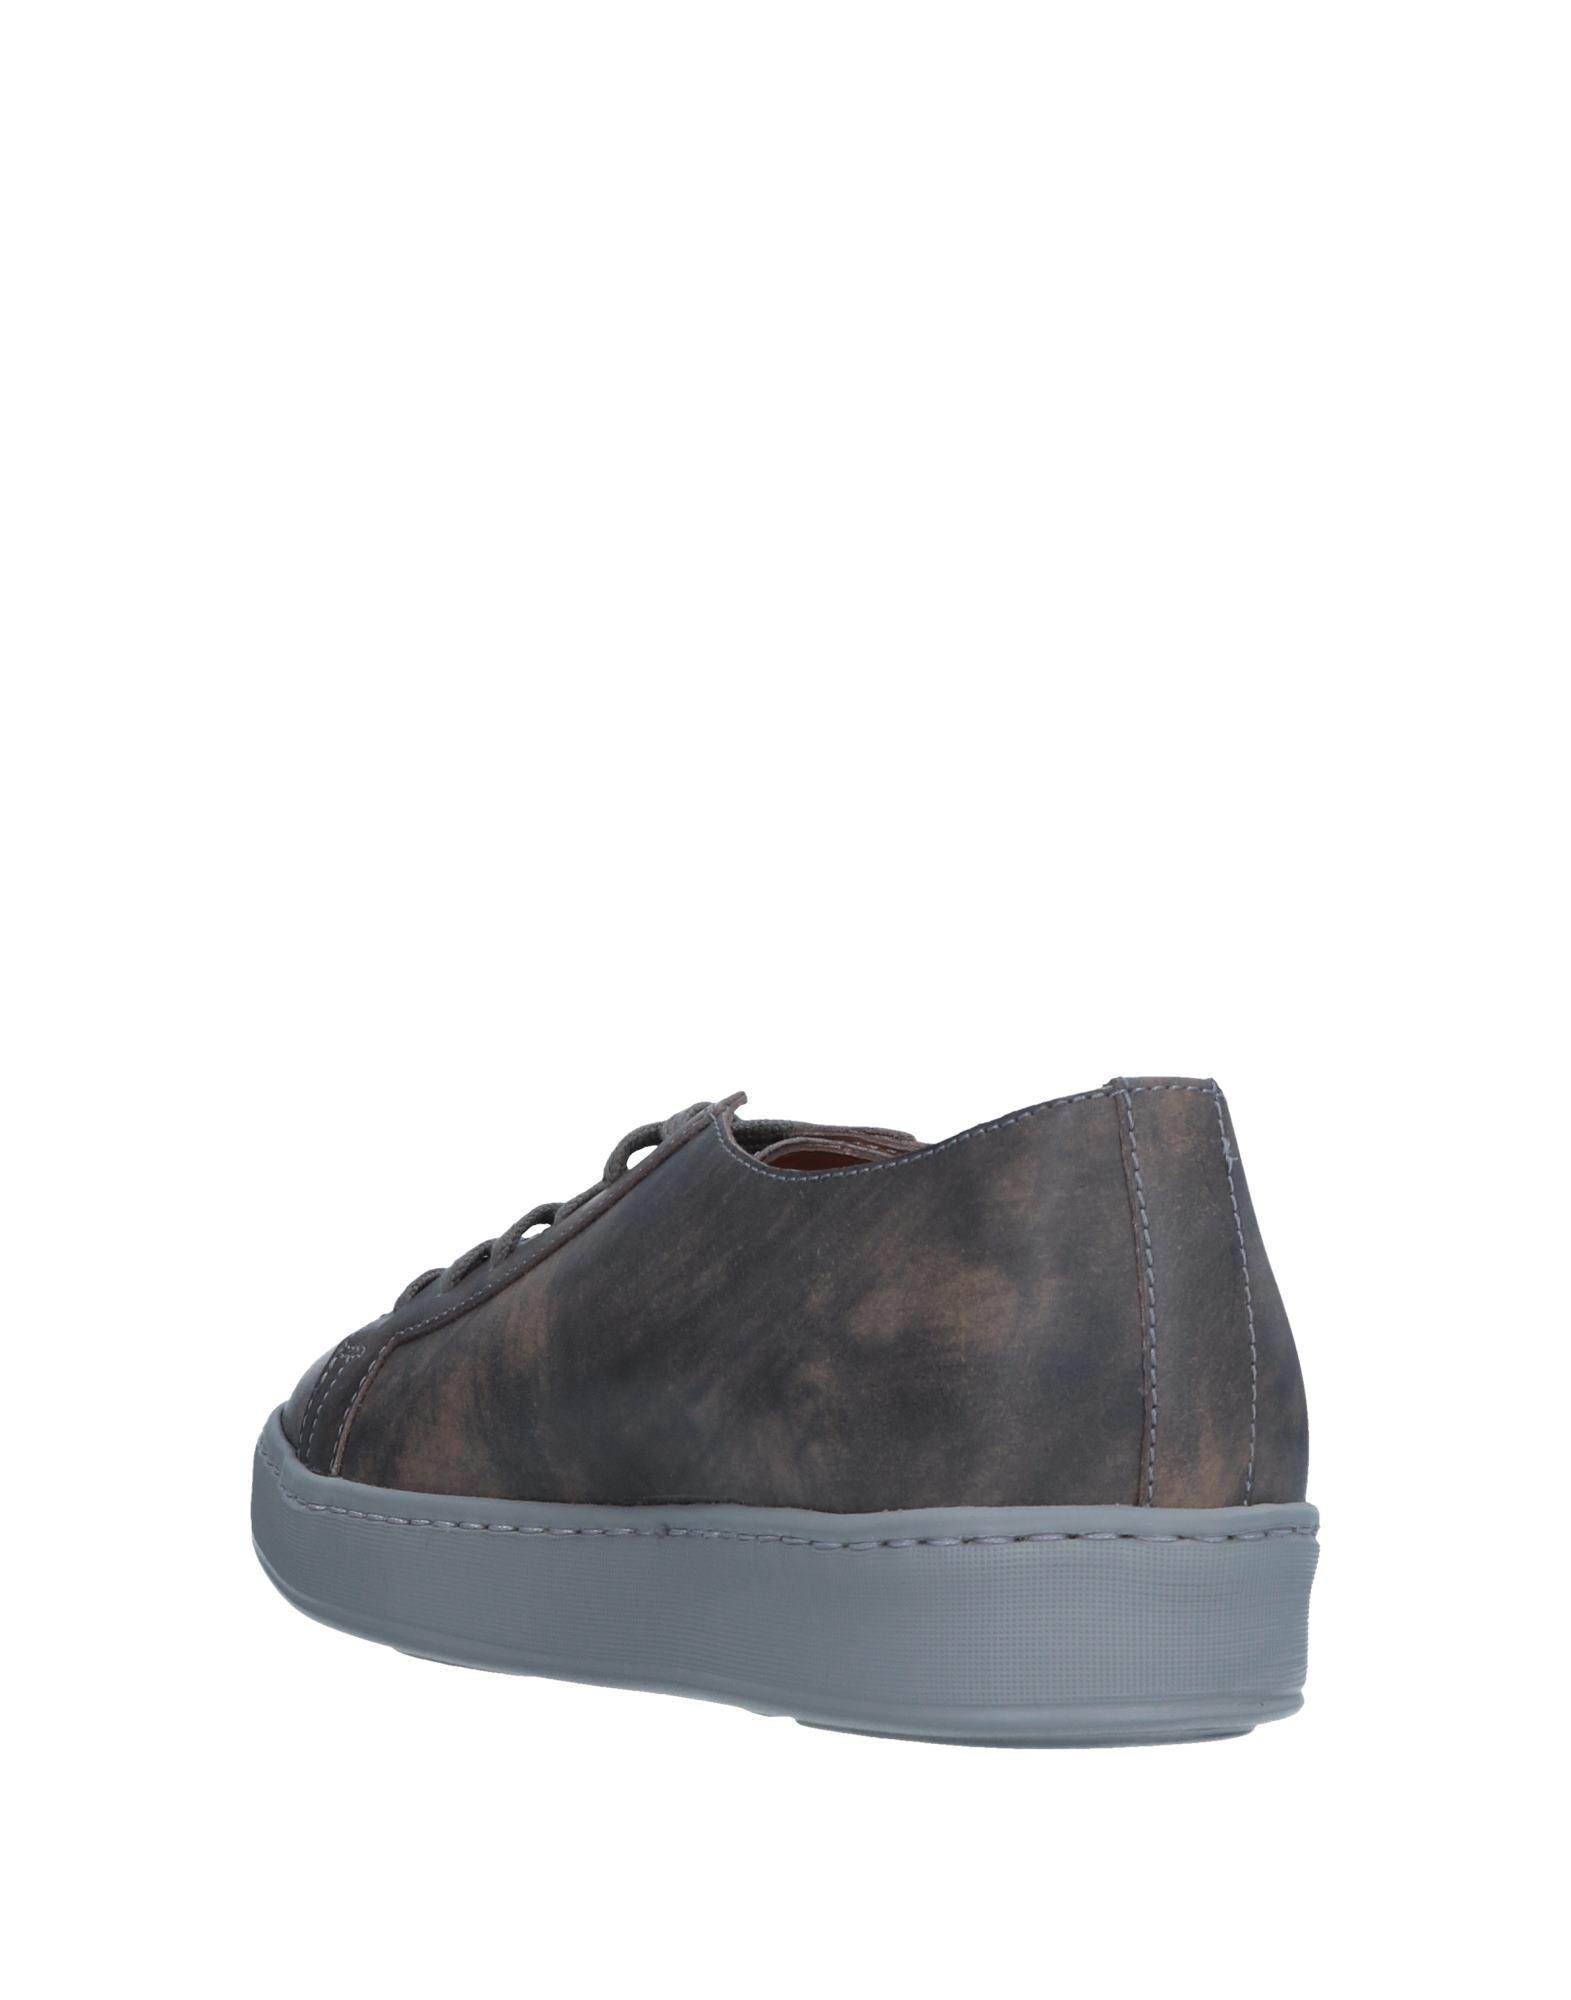 Santoni Leather Low-tops & Sneakers in Khaki (Grey)